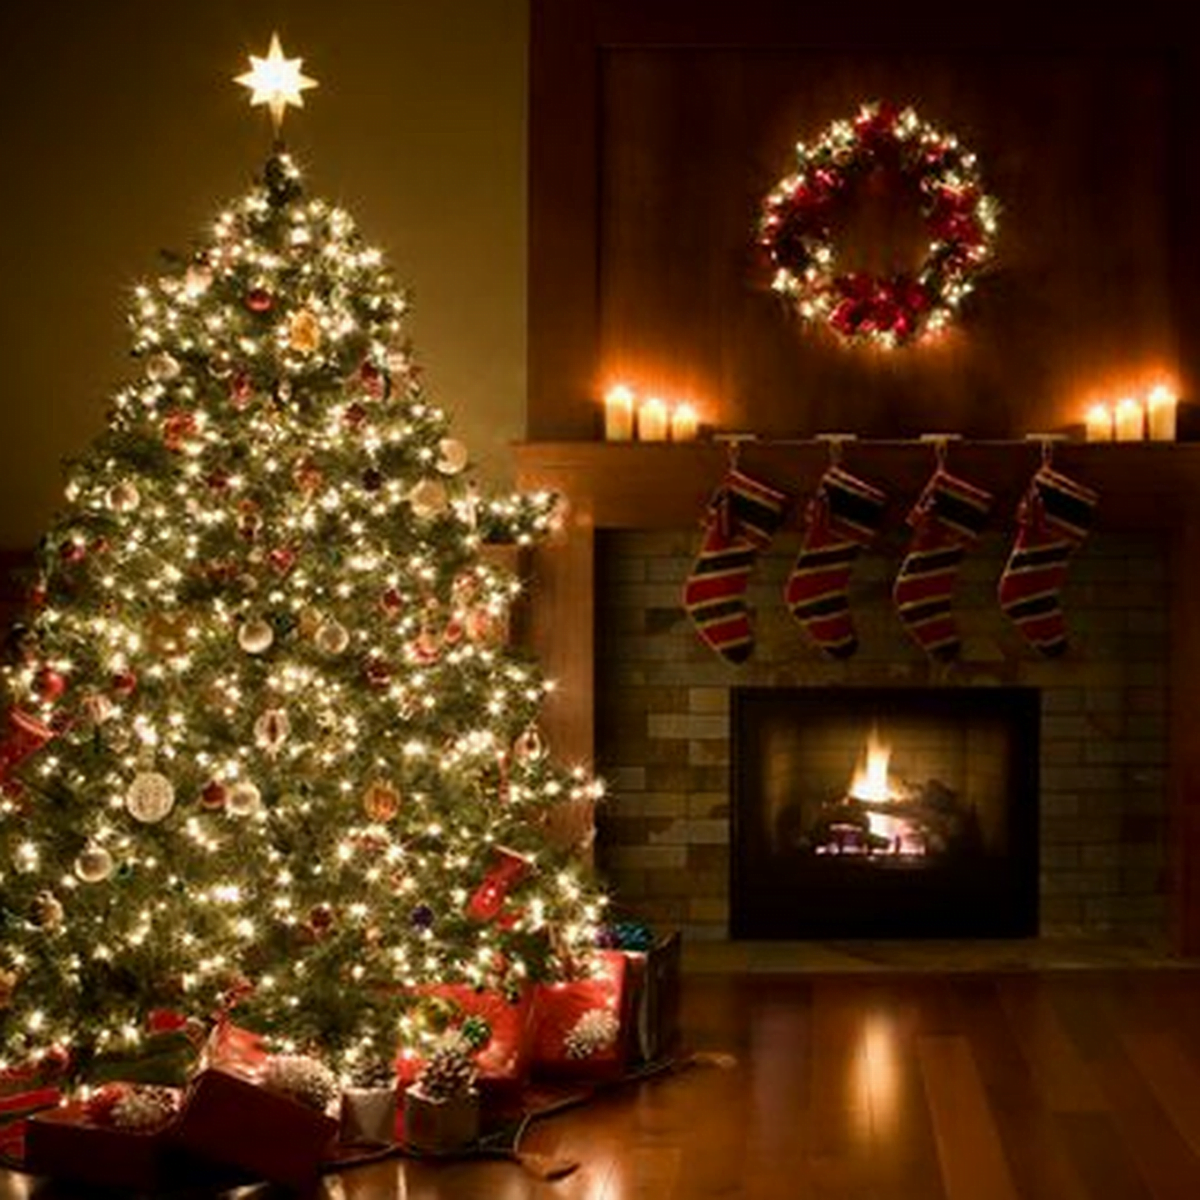 julepynt på juletreet